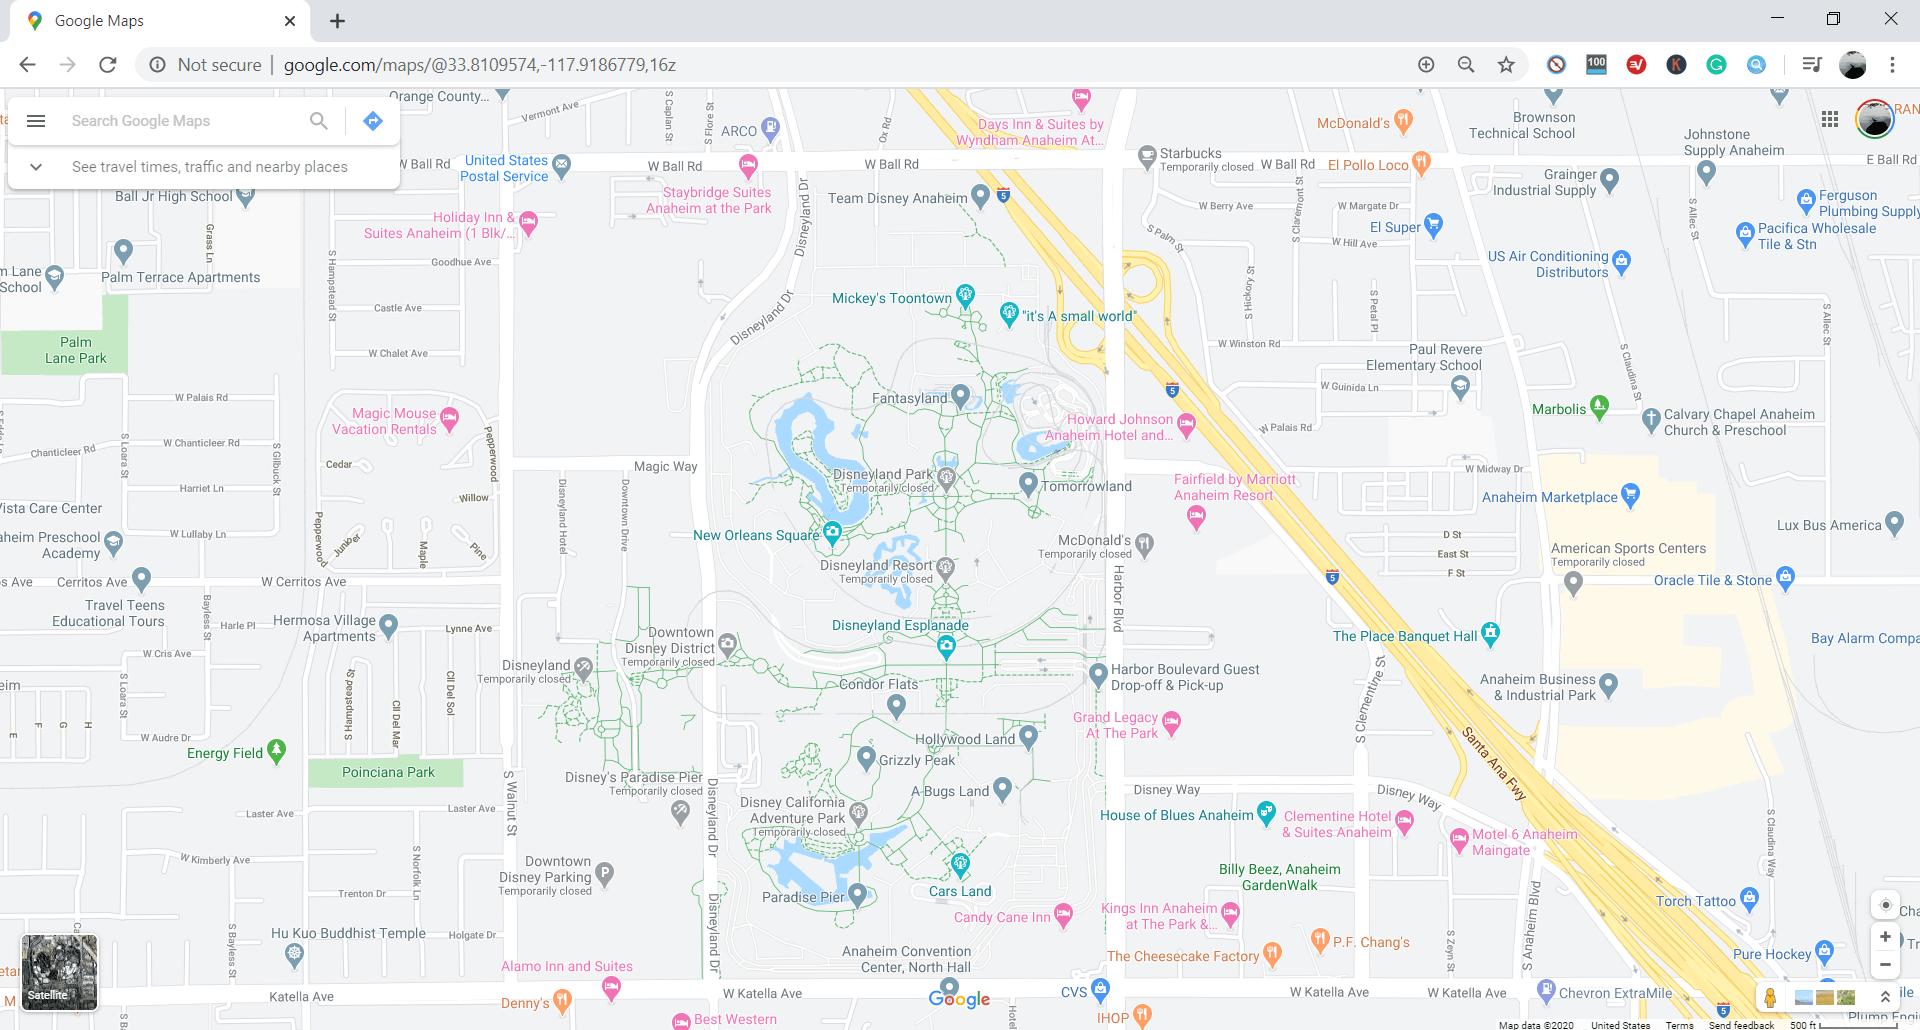 Disneyland Google Maps